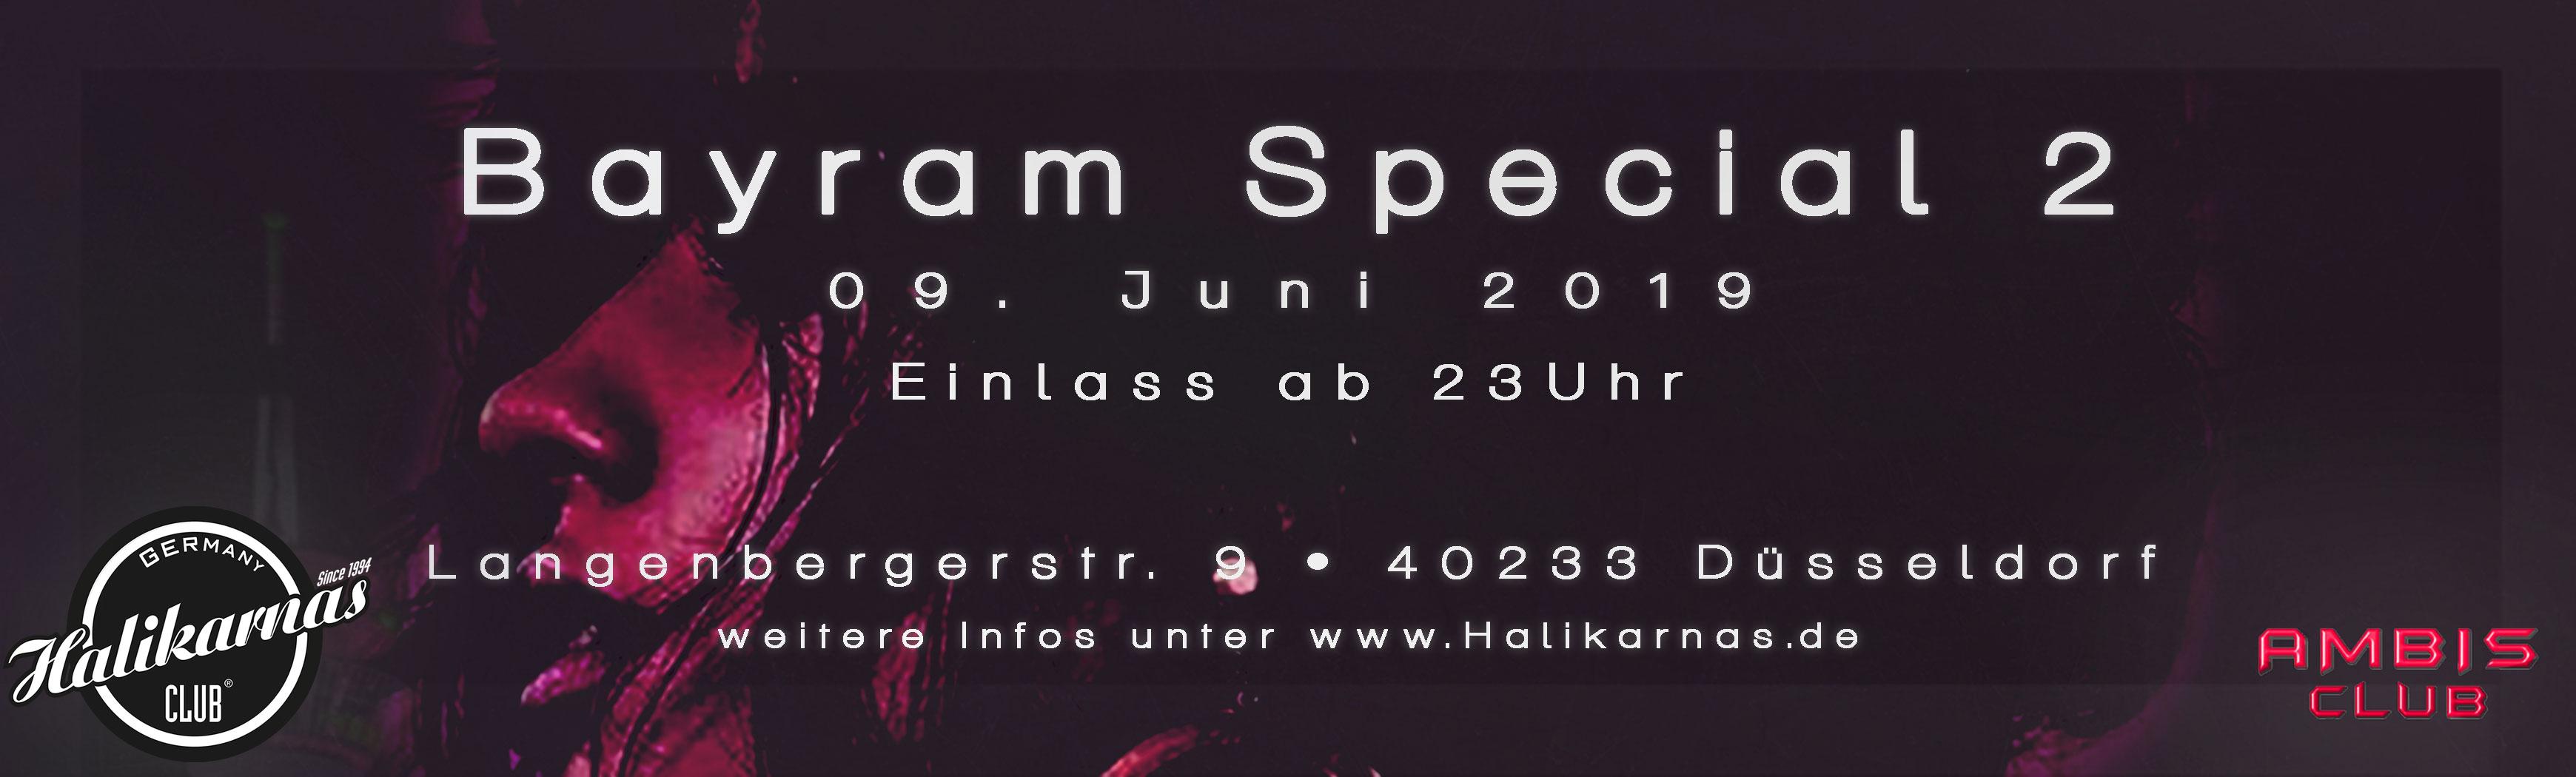 So.09.06. Halikarnas Bayram Special 2 im Ambis Düsseldorf